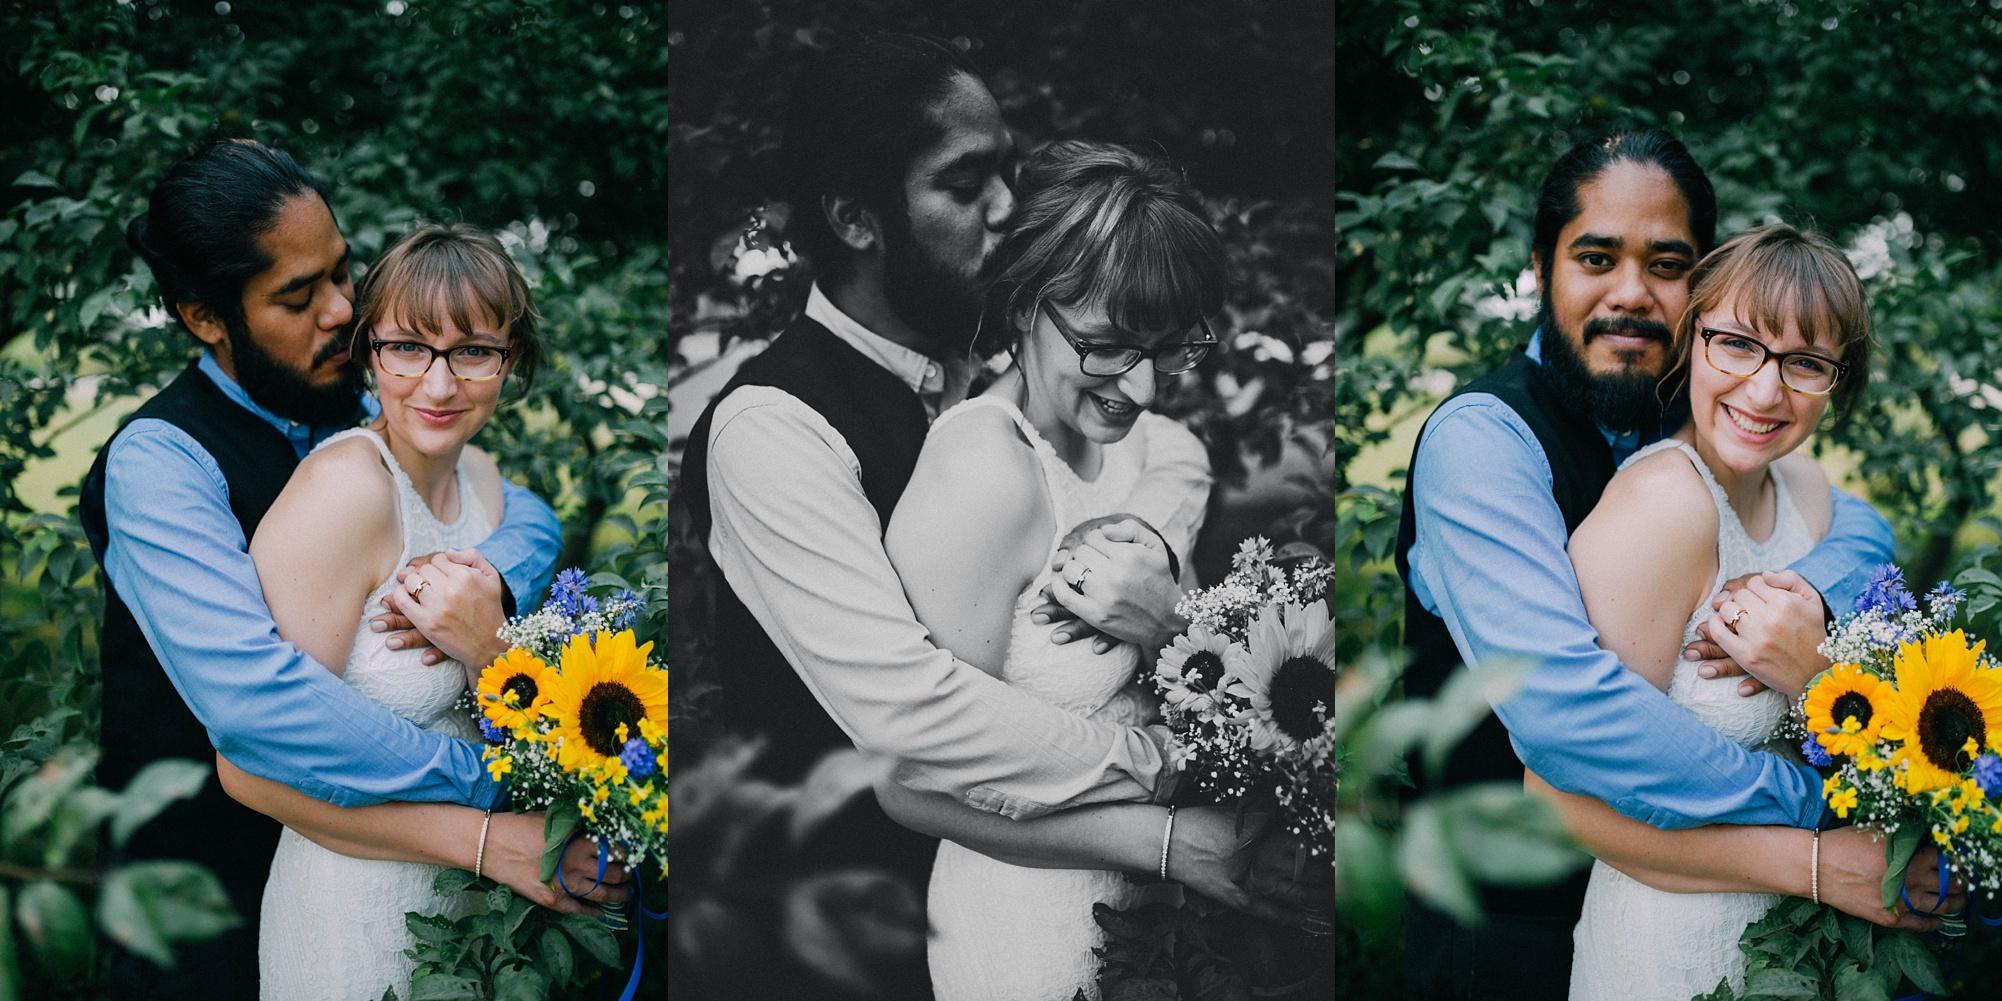 ashley_vos_seattle_ wedding_photographer_0460.jpg